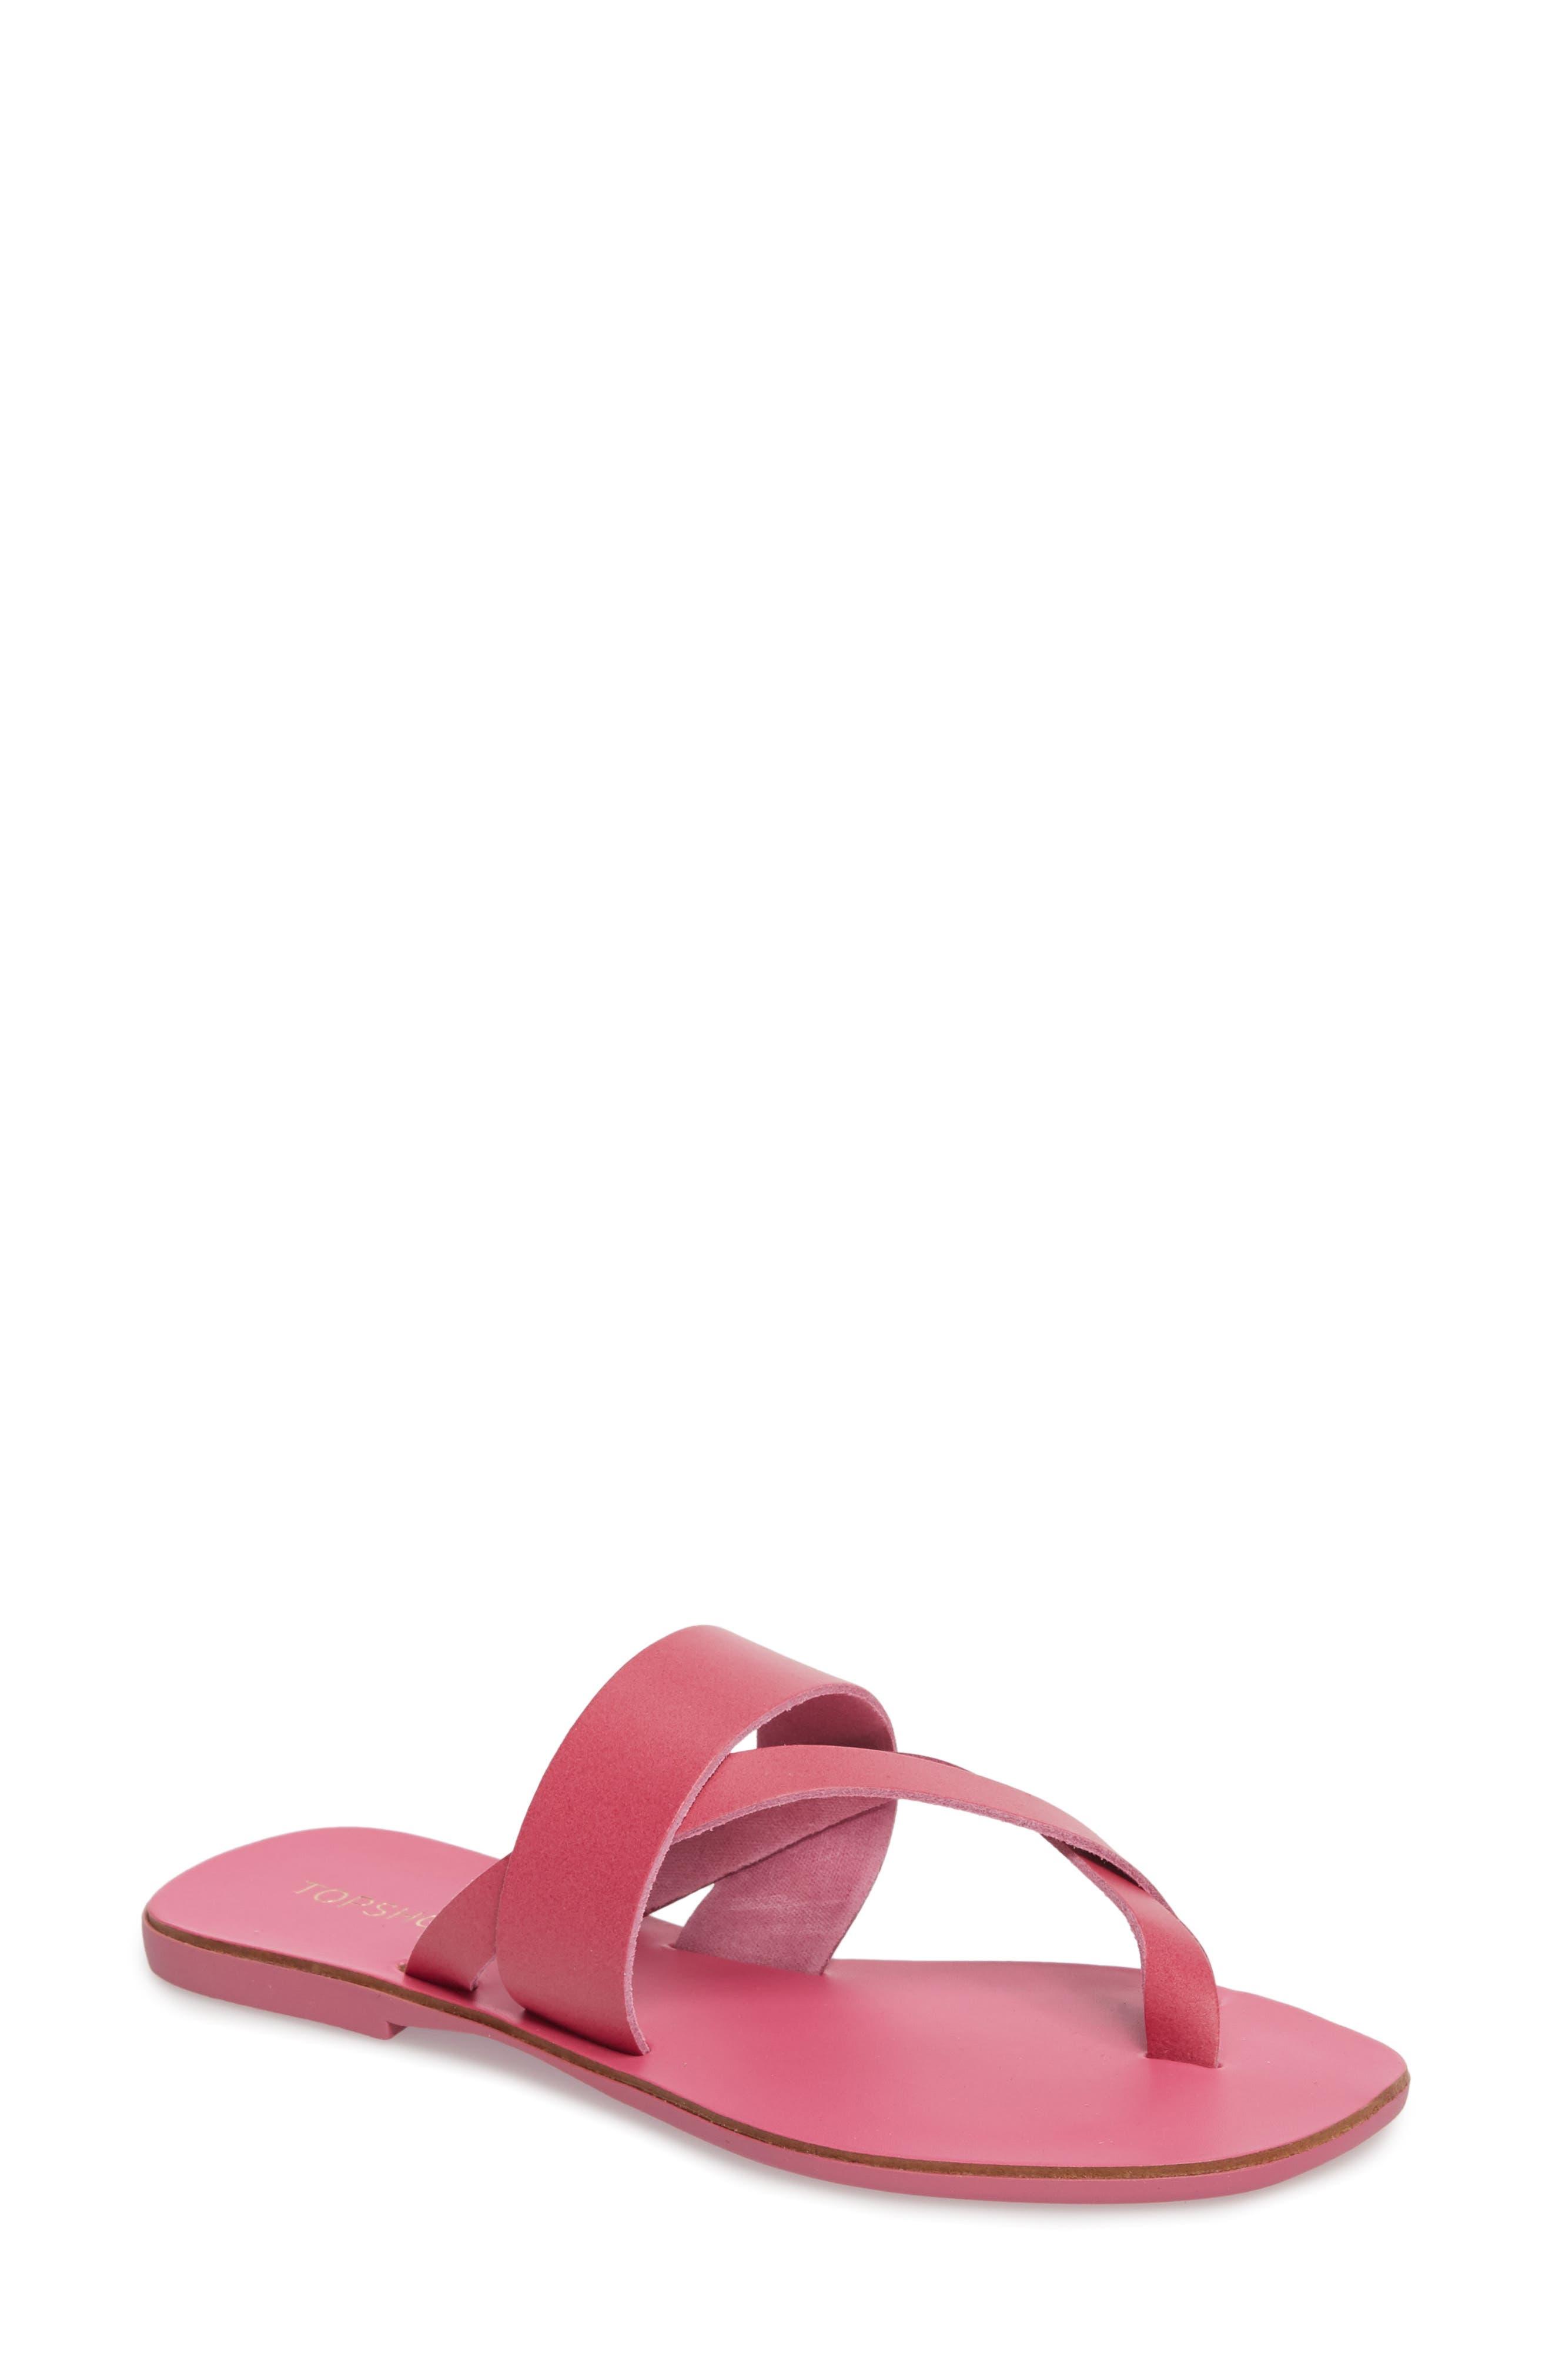 Harper Sandal,                             Main thumbnail 1, color,                             Pink